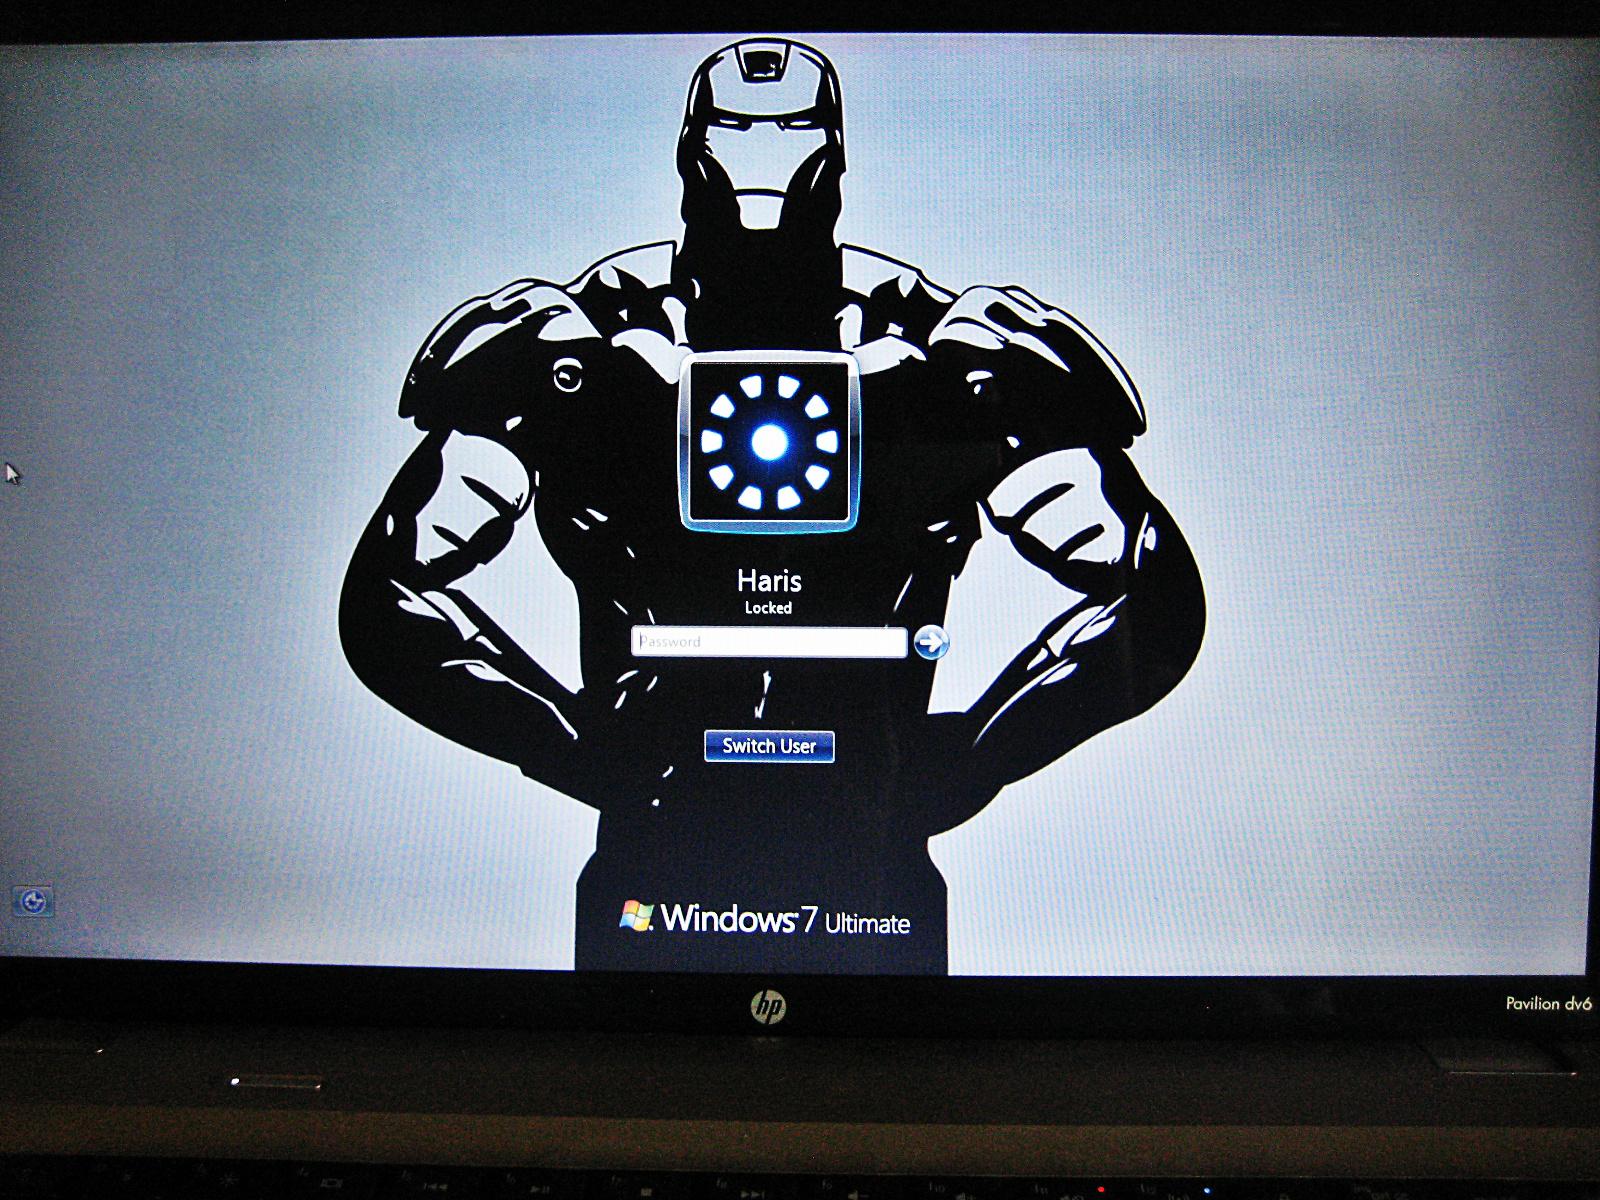 change and customize windows 7s logon screen using regedit